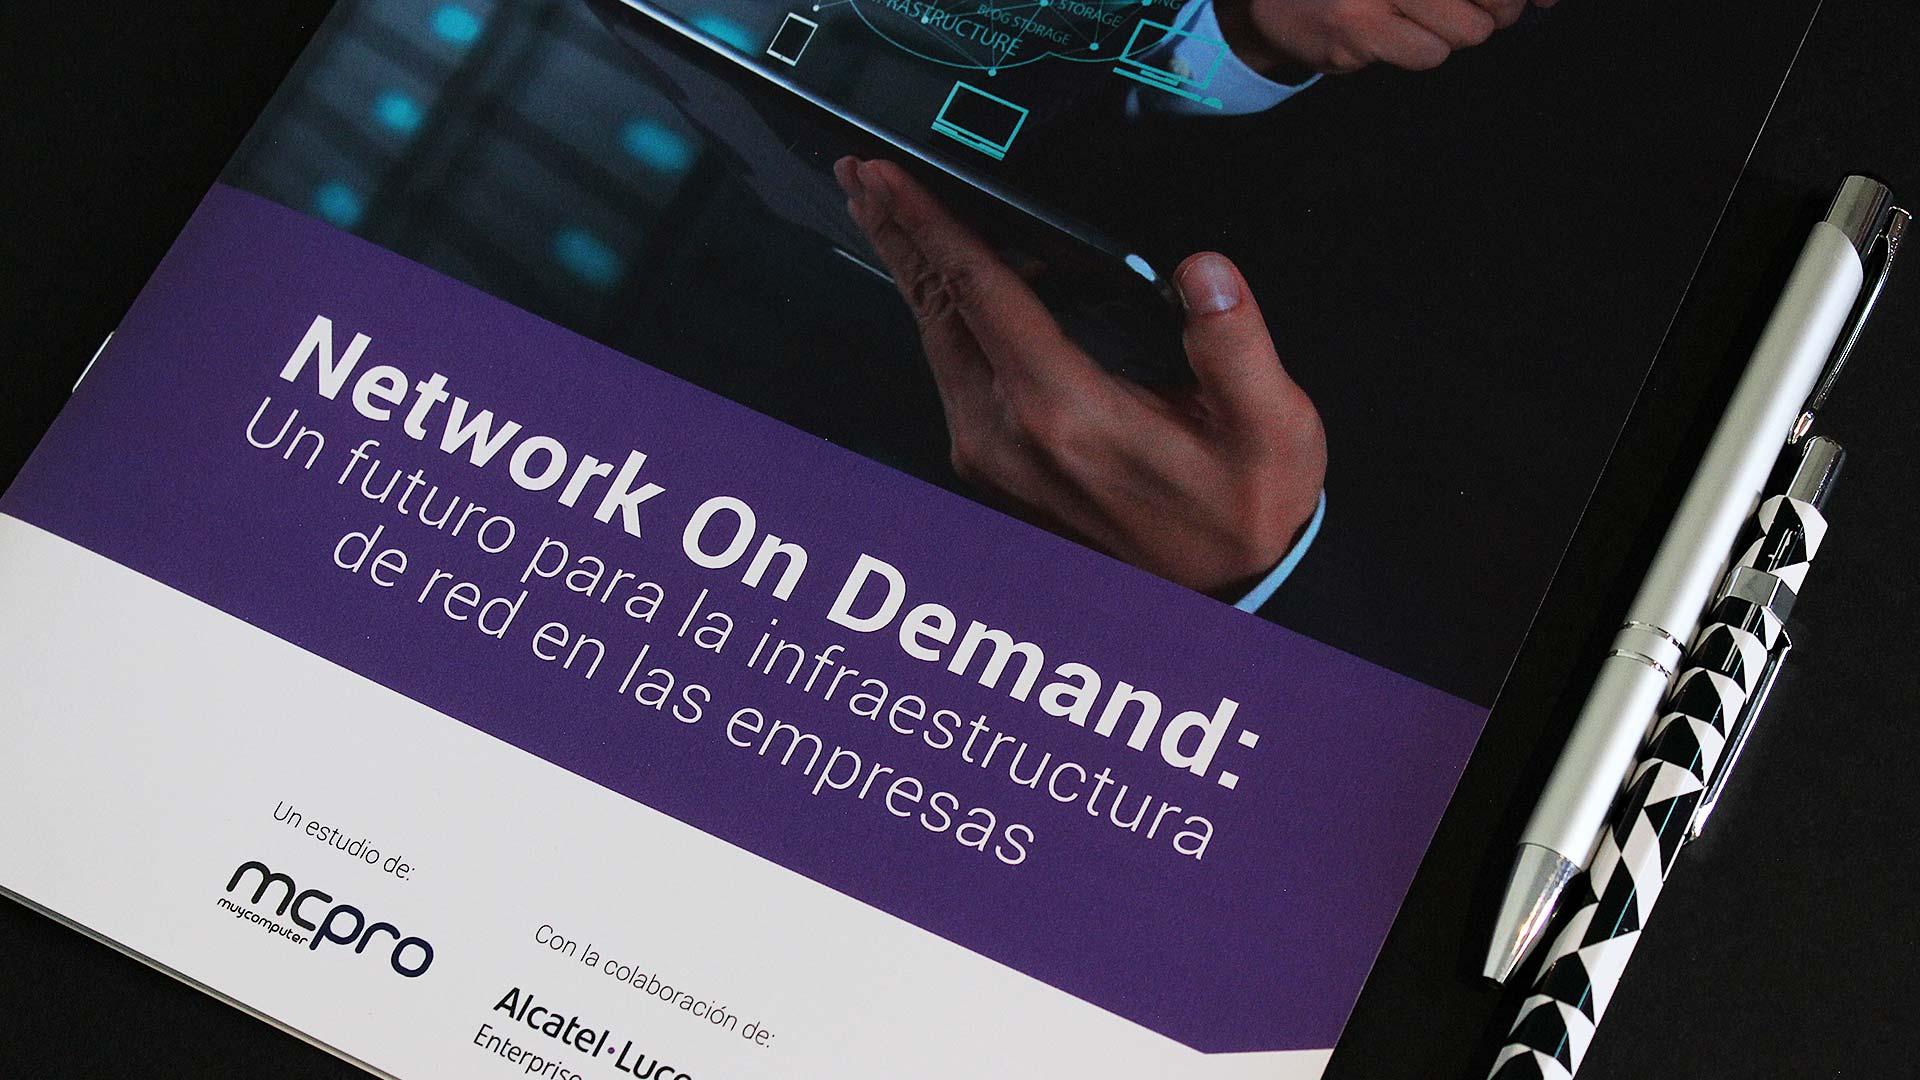 alcatel-content-marketing-informe-resumen-ejecutivo-networkondemand-ebook-2016-08